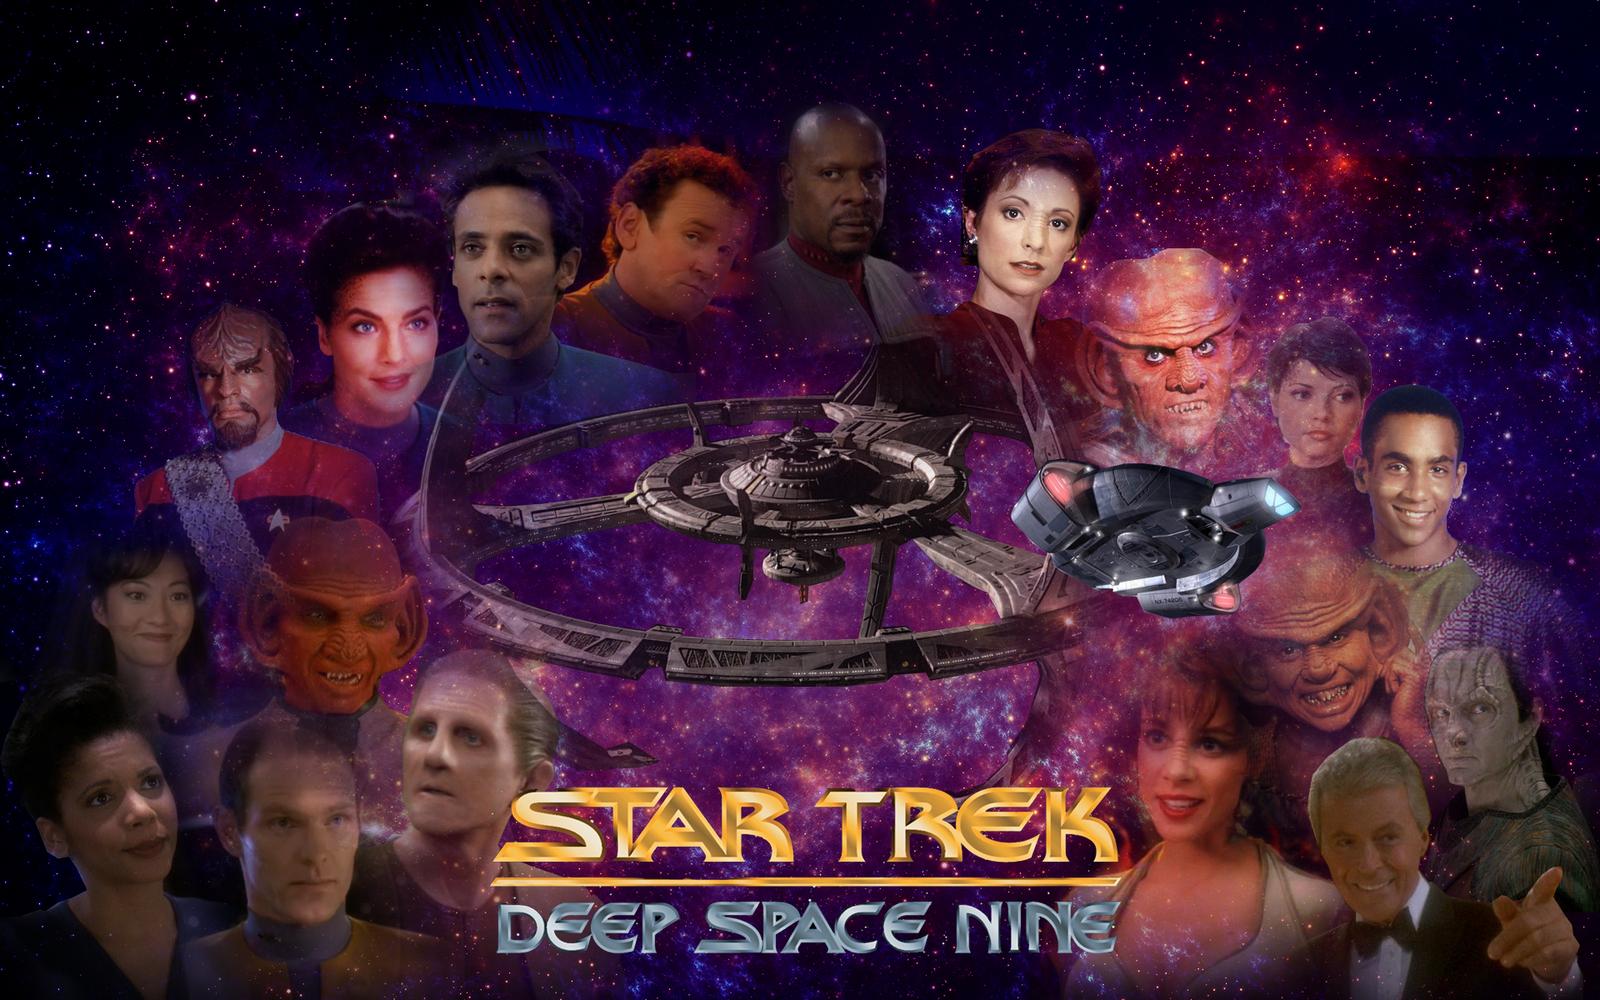 Star Trek Saga - Deep Space Nine by Camuska